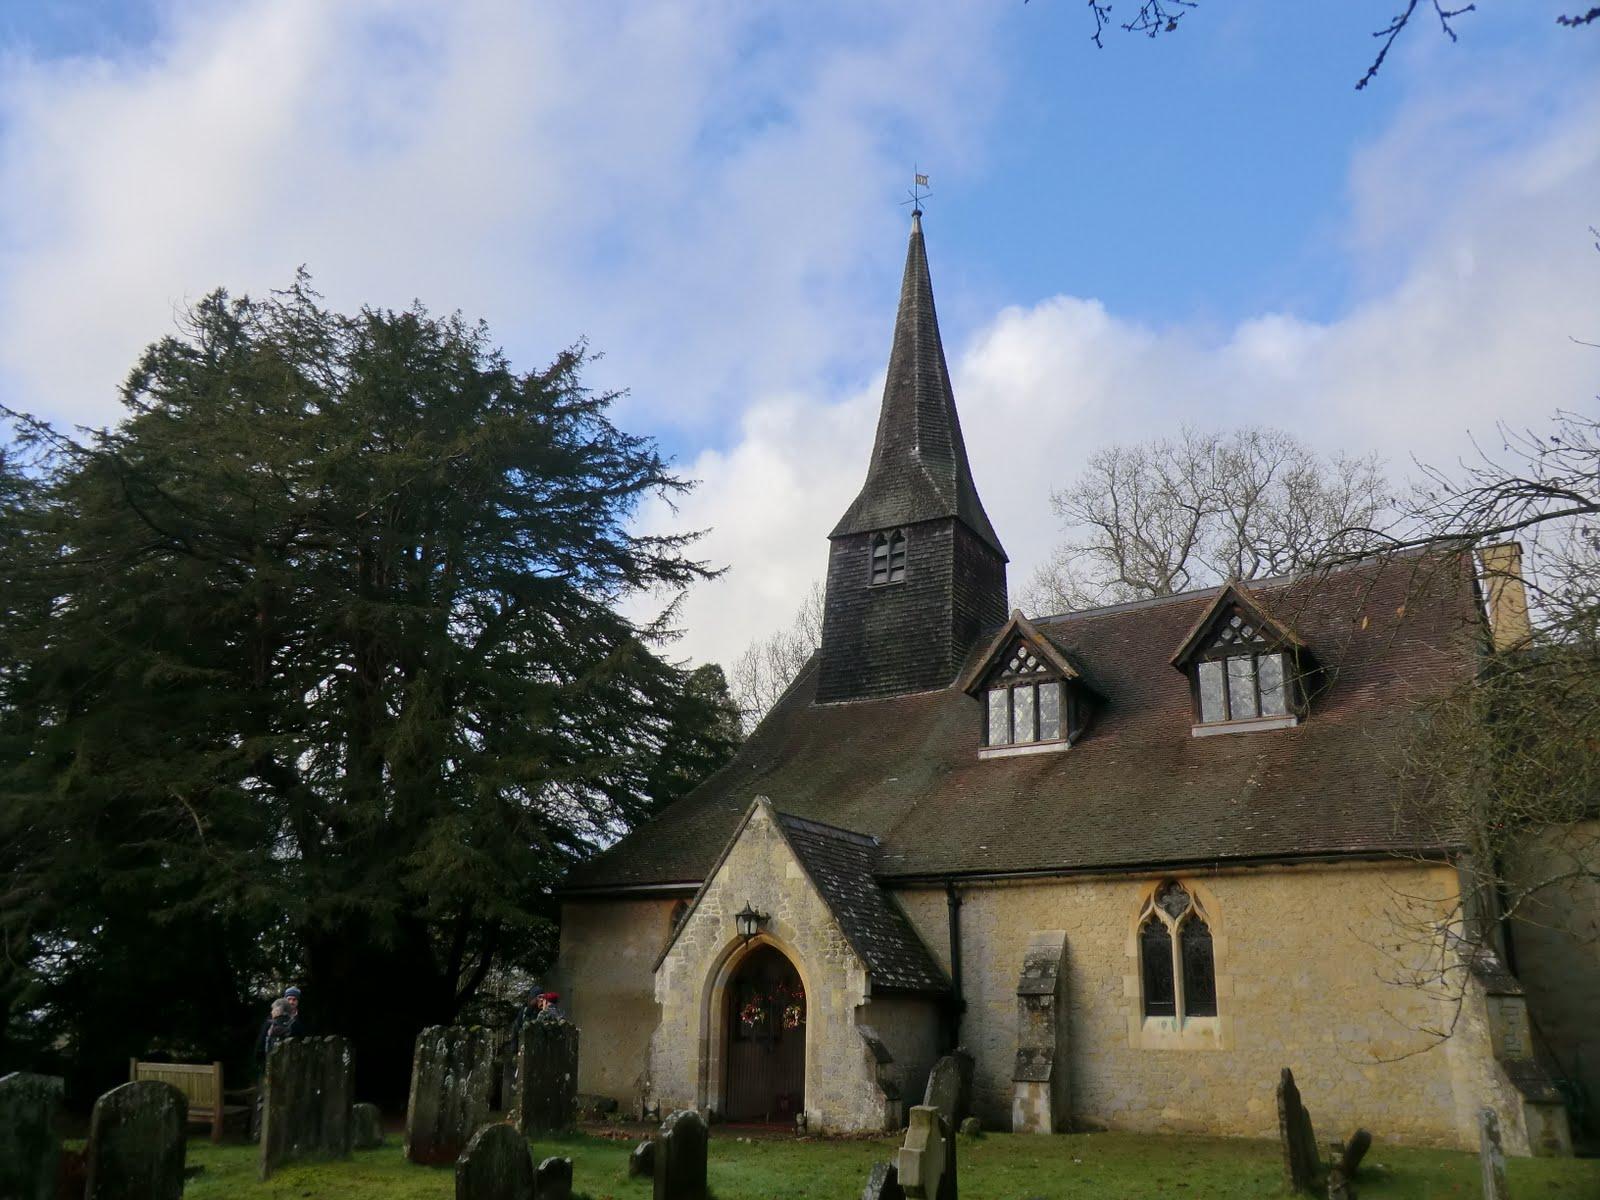 CIMG5140 St Peter's church, Tandridge